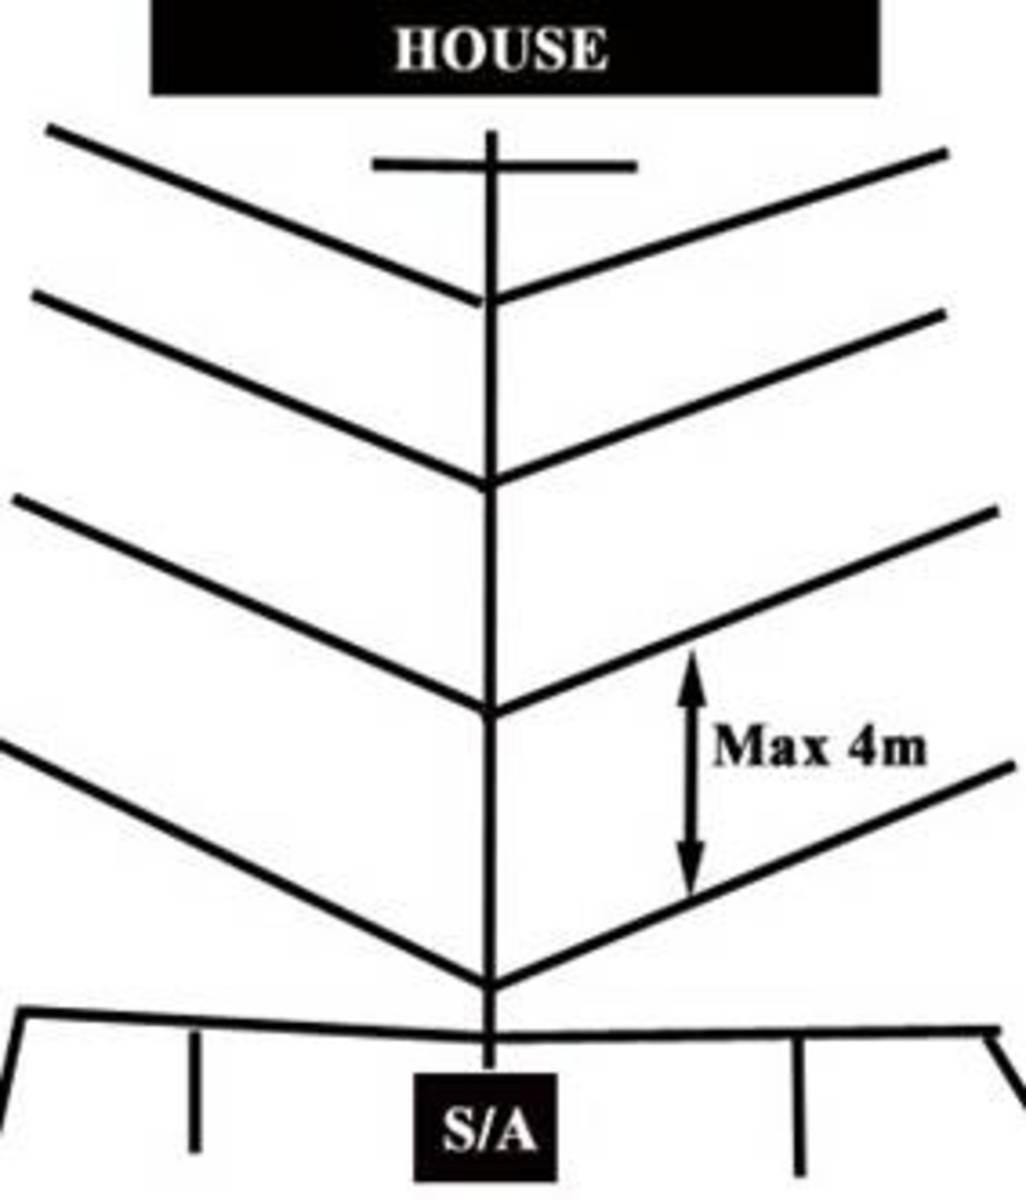 herring bone layout of drainage pipes